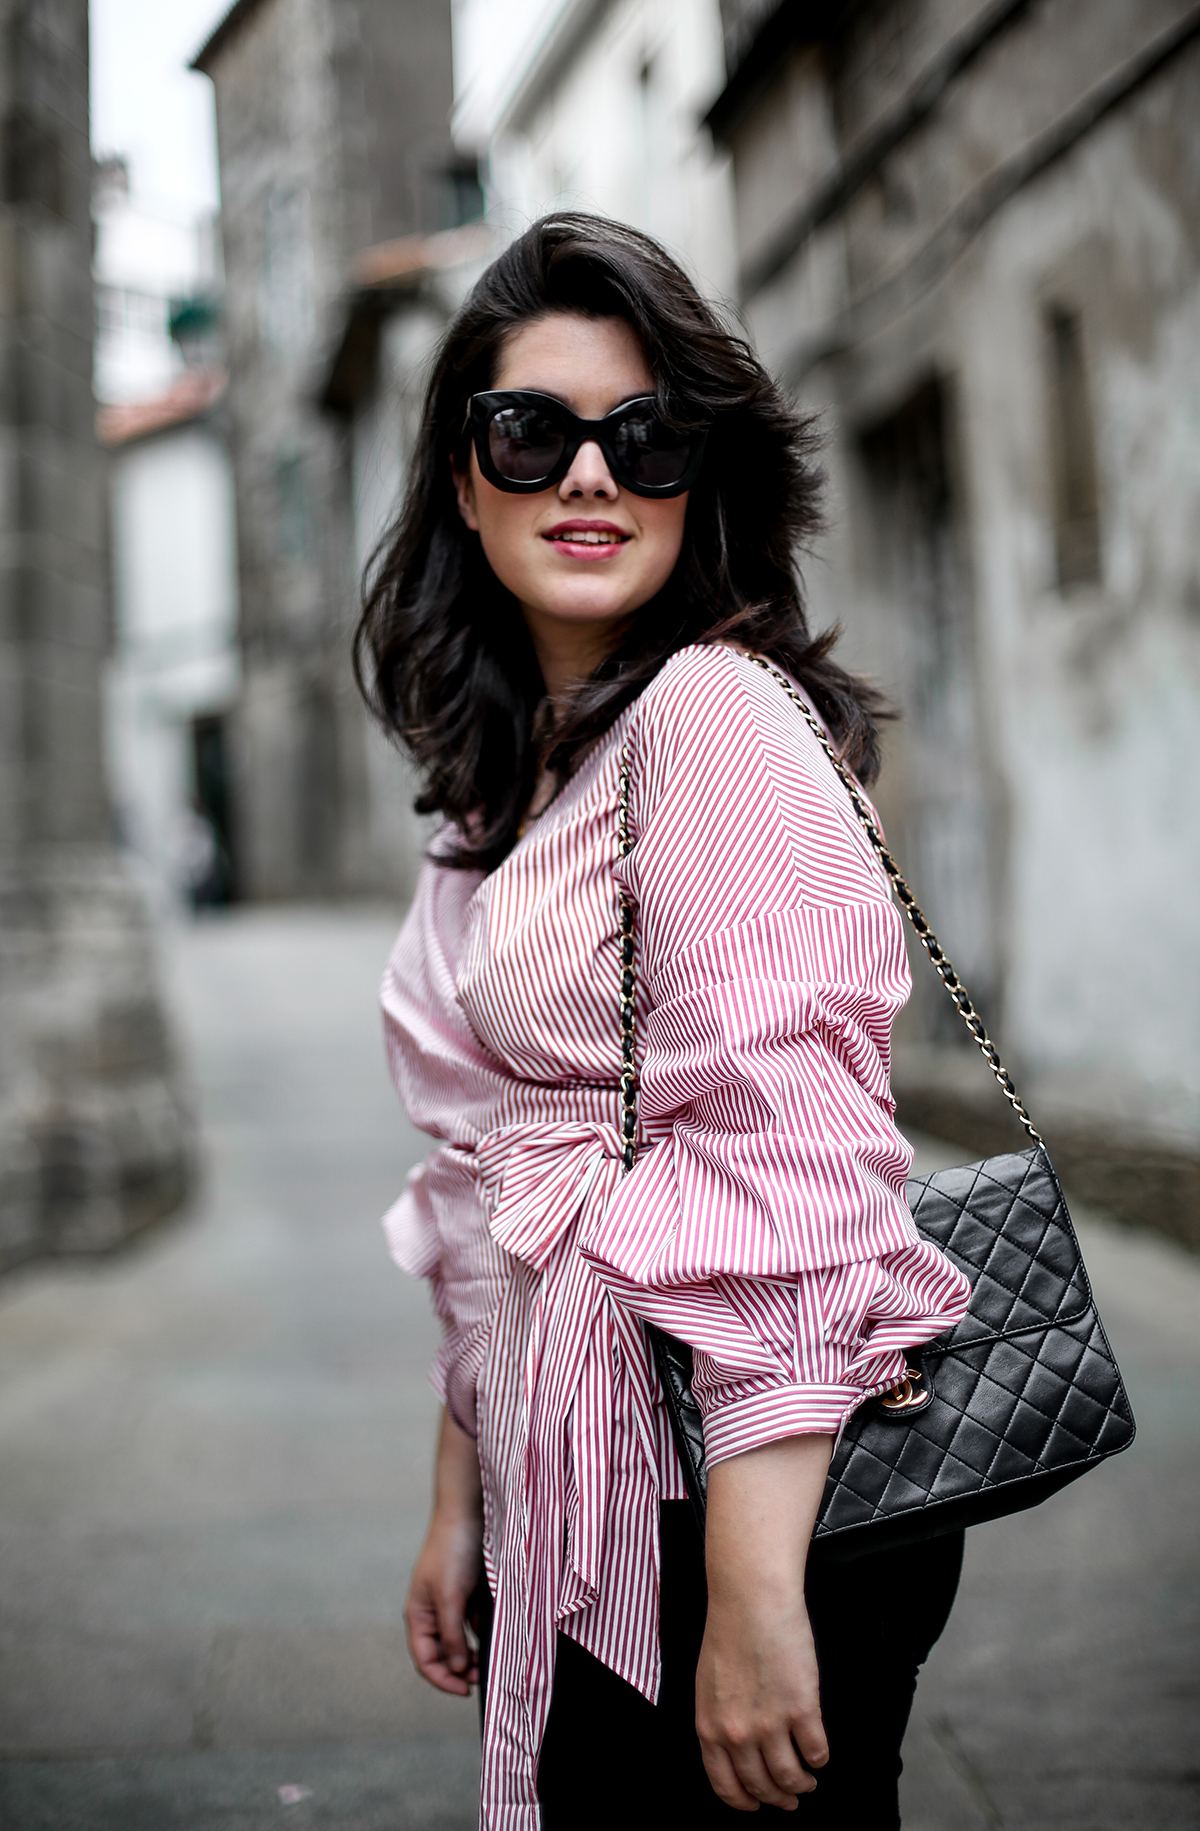 blusa-cruzada-zara-chanel-vintage-vestiaire-collective-myblueberrynightsblog7